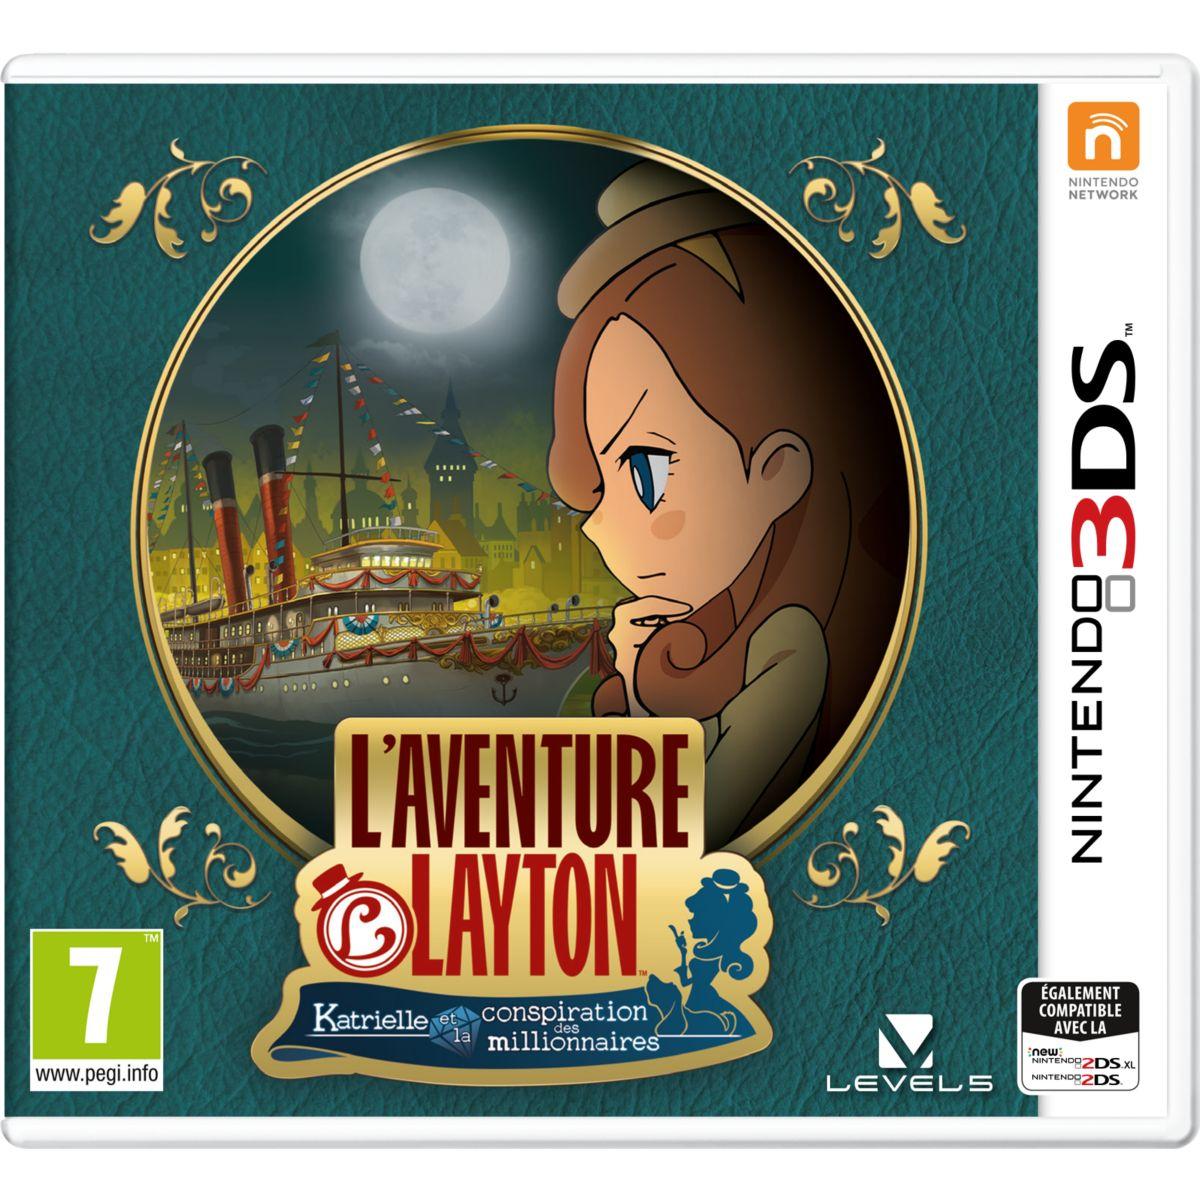 Jeu 3DS NINTENDO L'Aventure Layton : Kat (photo)